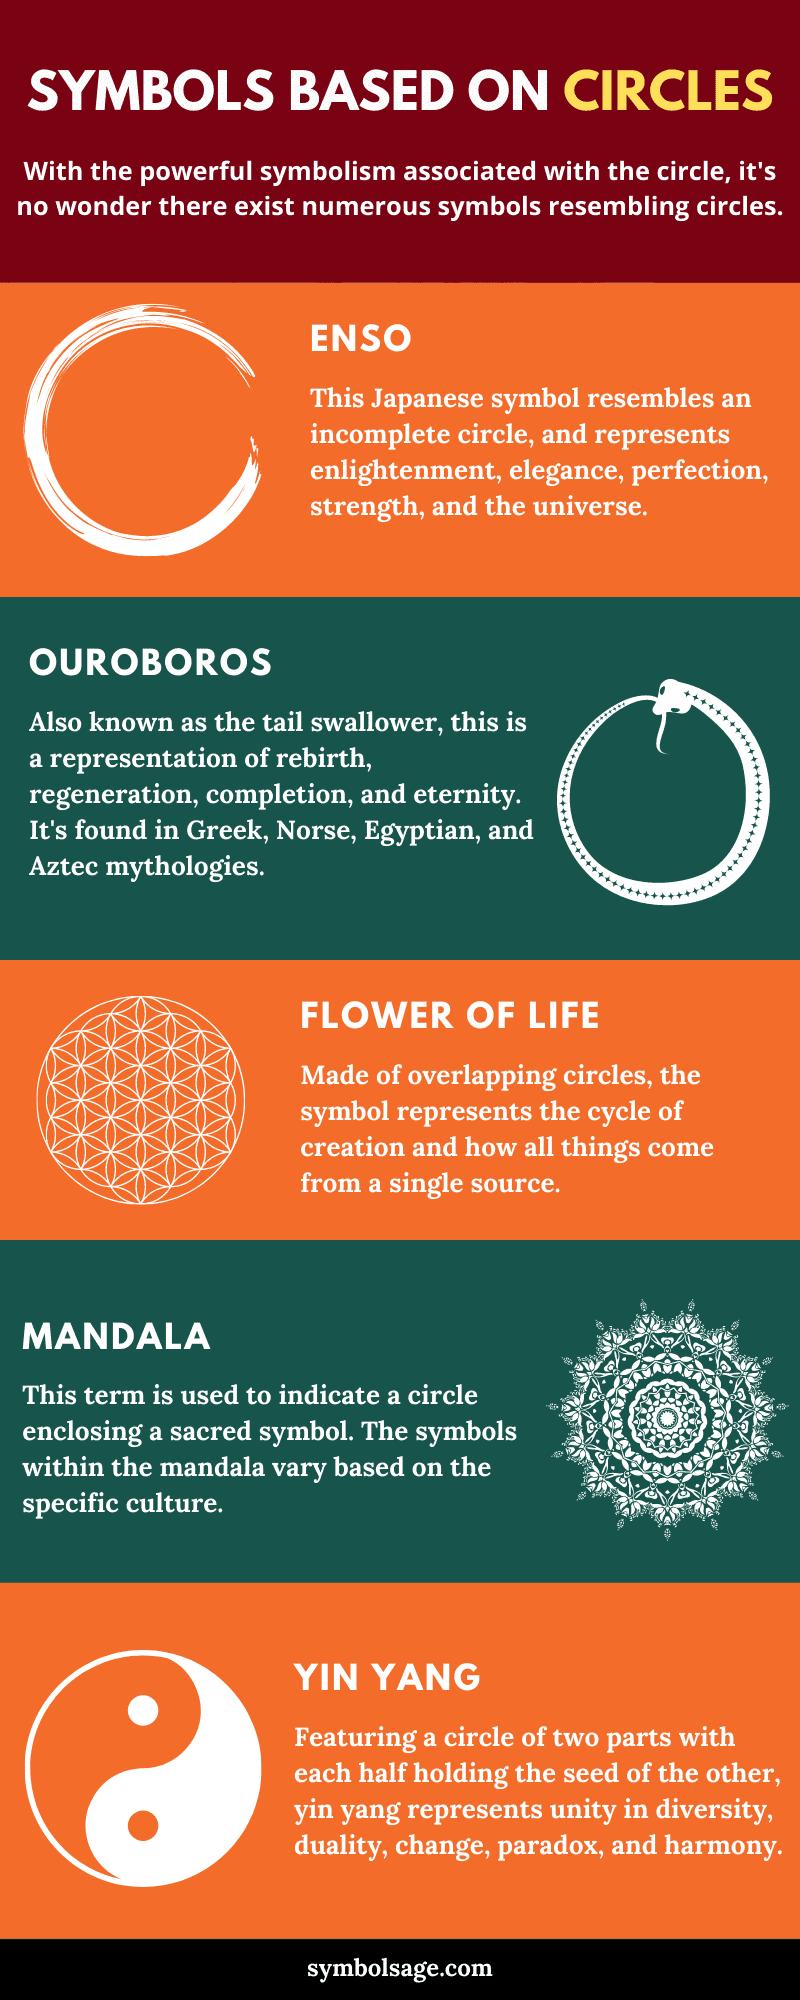 Symbols based on circles